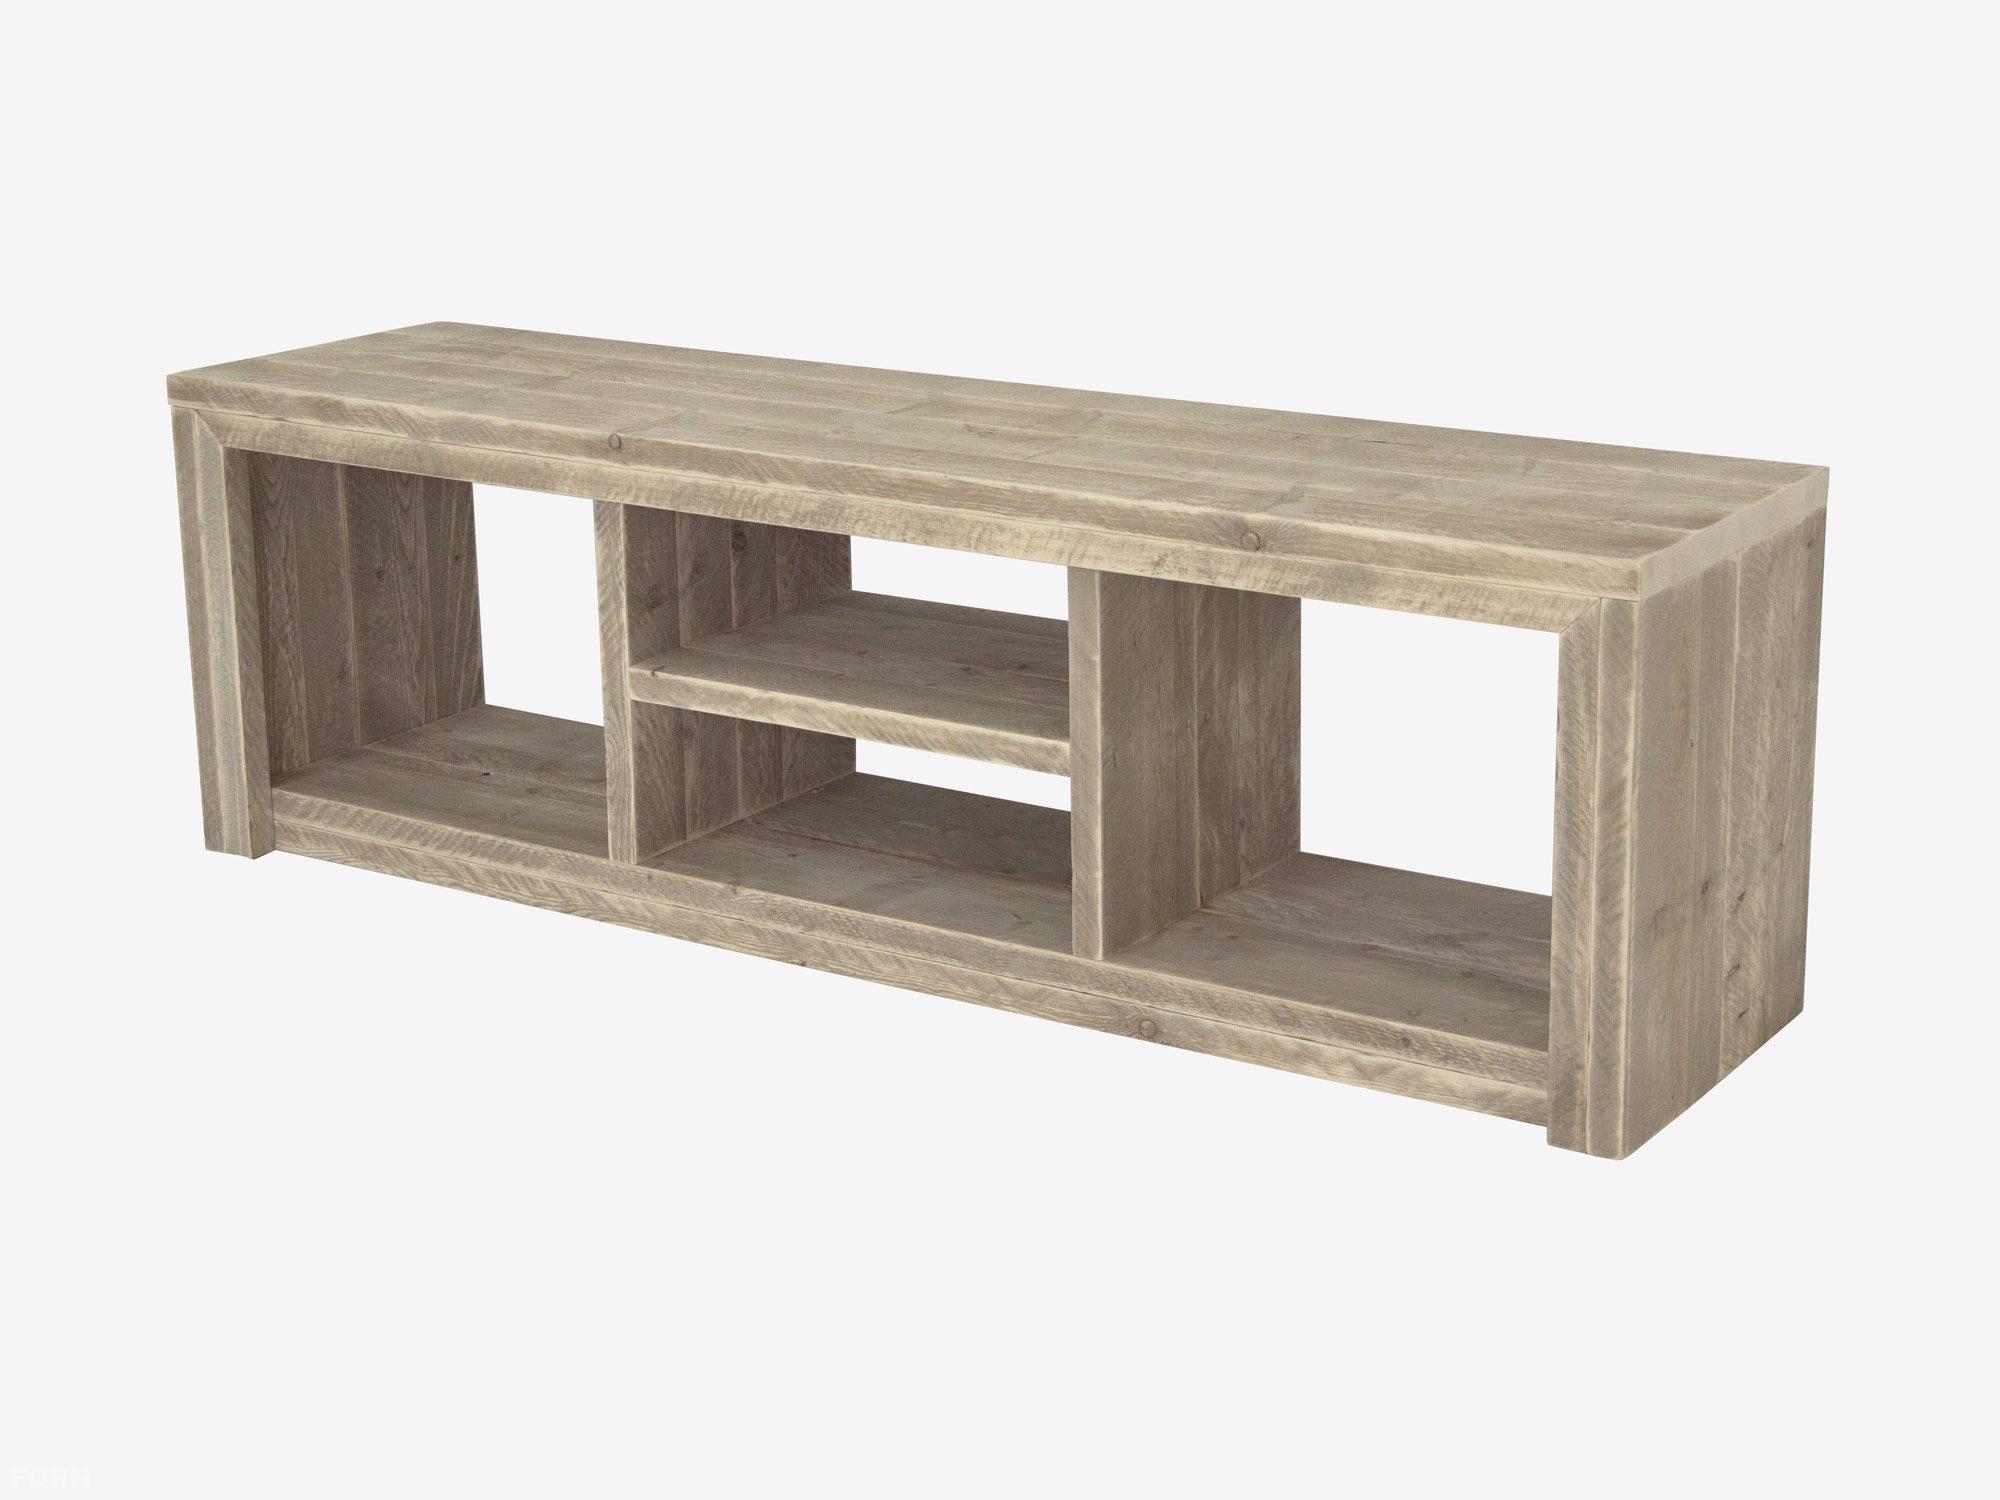 Steigerhouten tv meubel laghetto tv kast van steigerhout for Ladenblok 1 meter breed